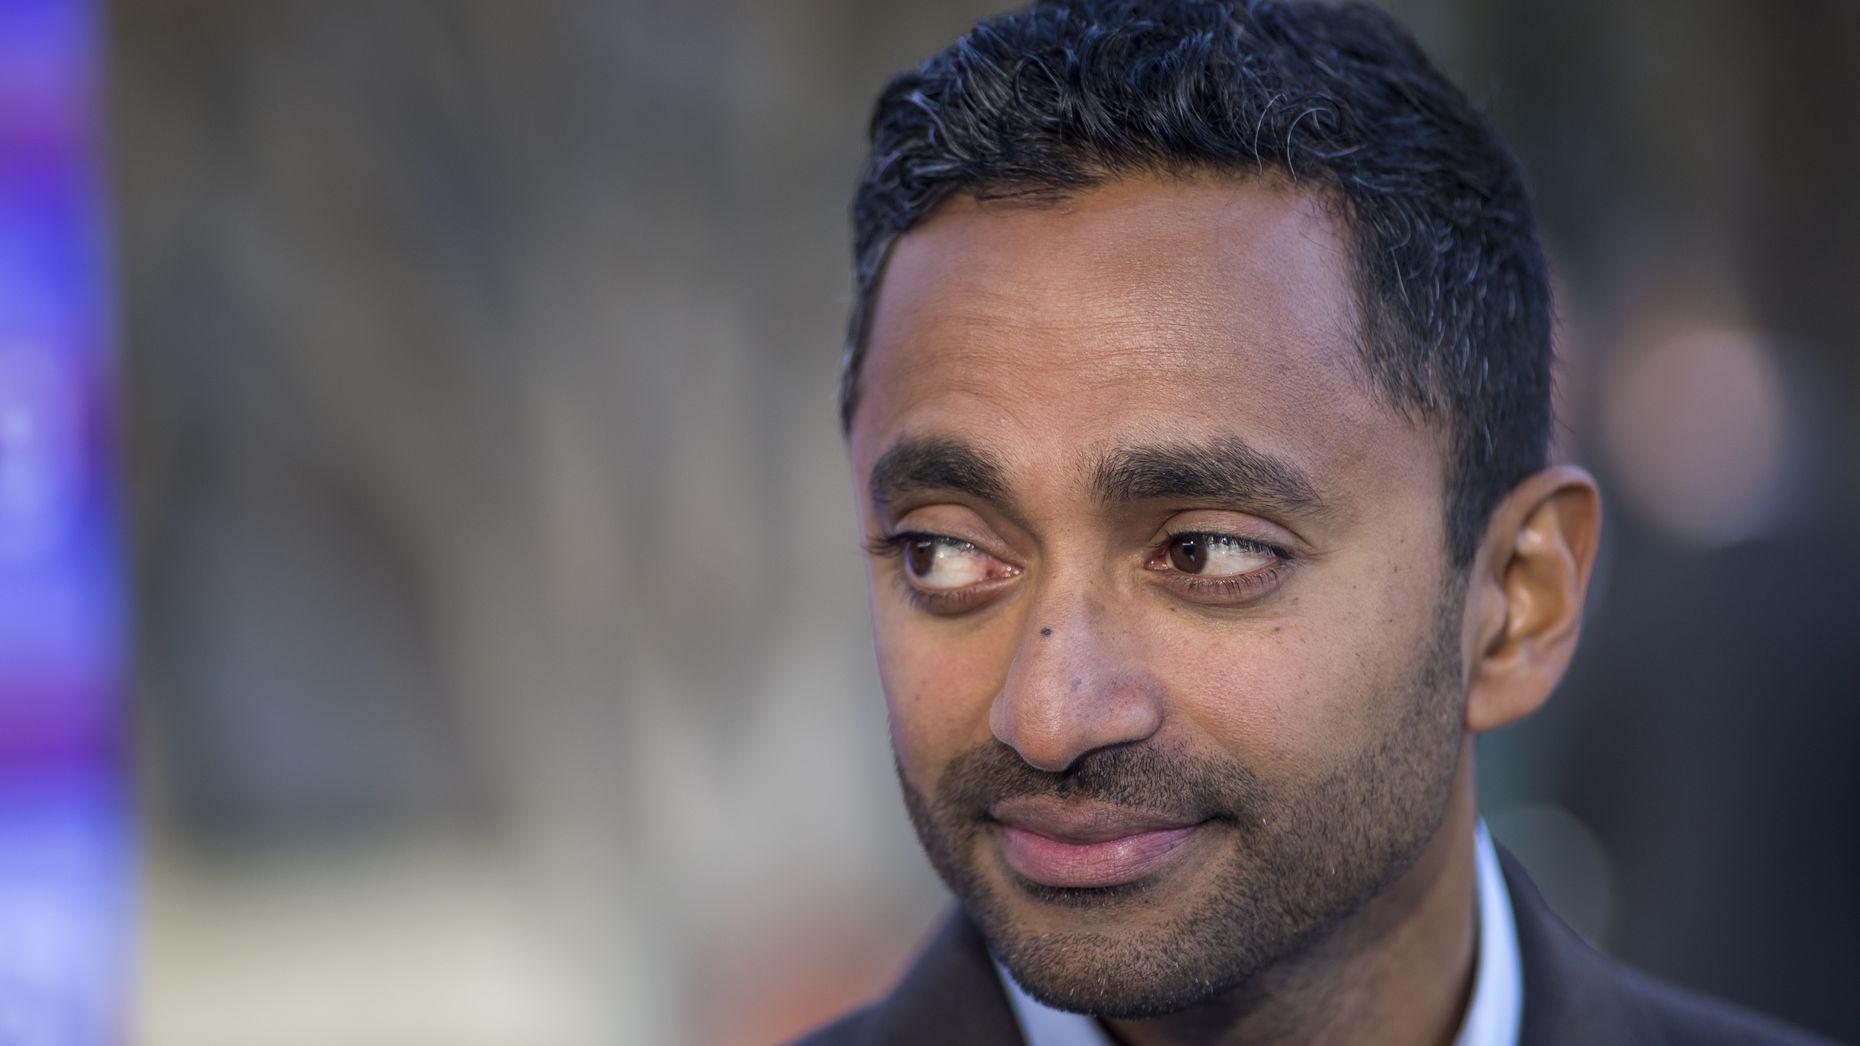 Social Capital Founder & CEO Chamath Palihapitiya. Photo by Bloomberg.